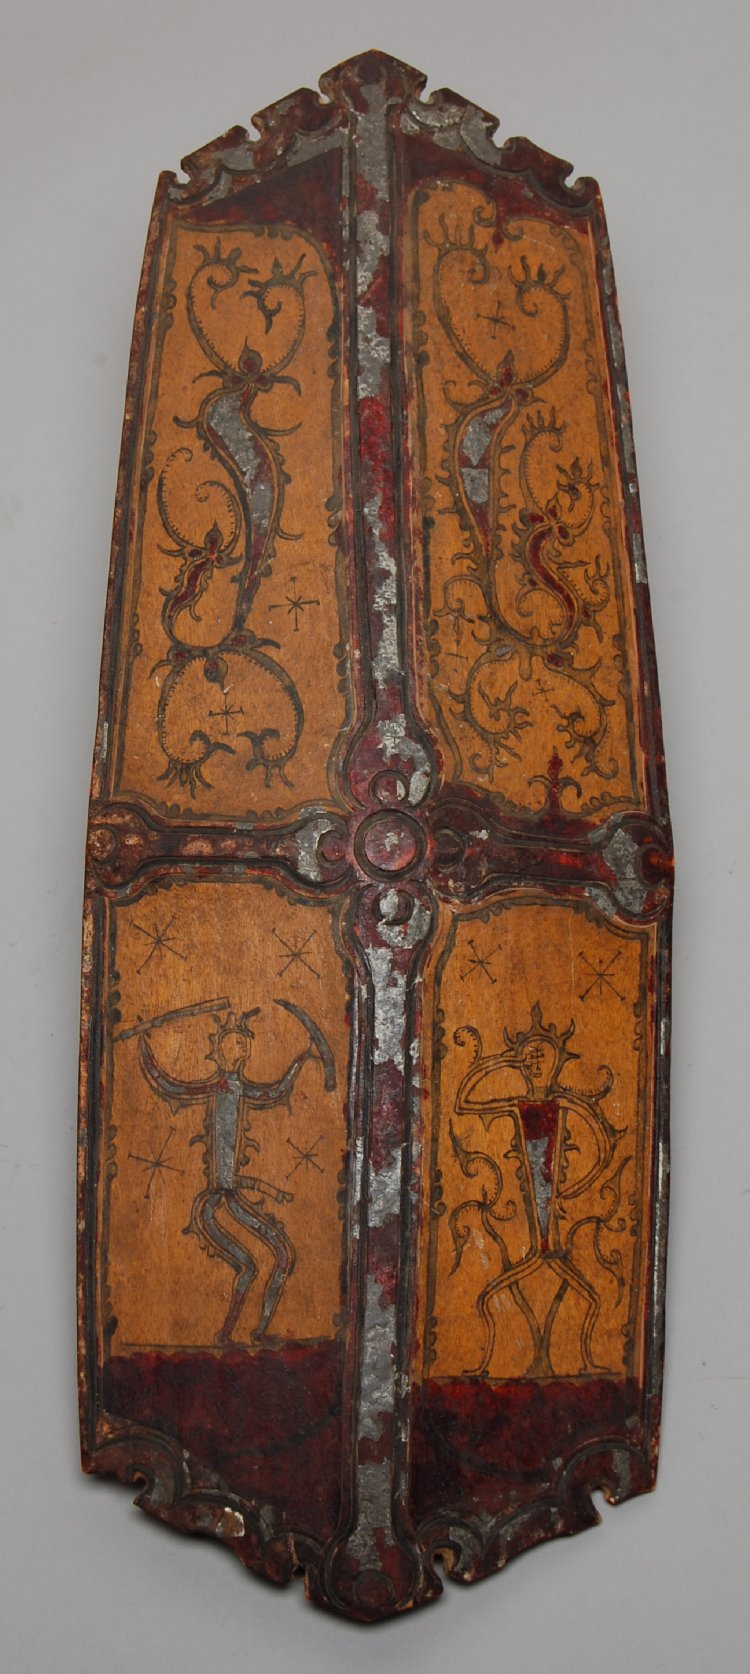 Warrior's Ceremonial Shield © The British Museum | United Kingdom